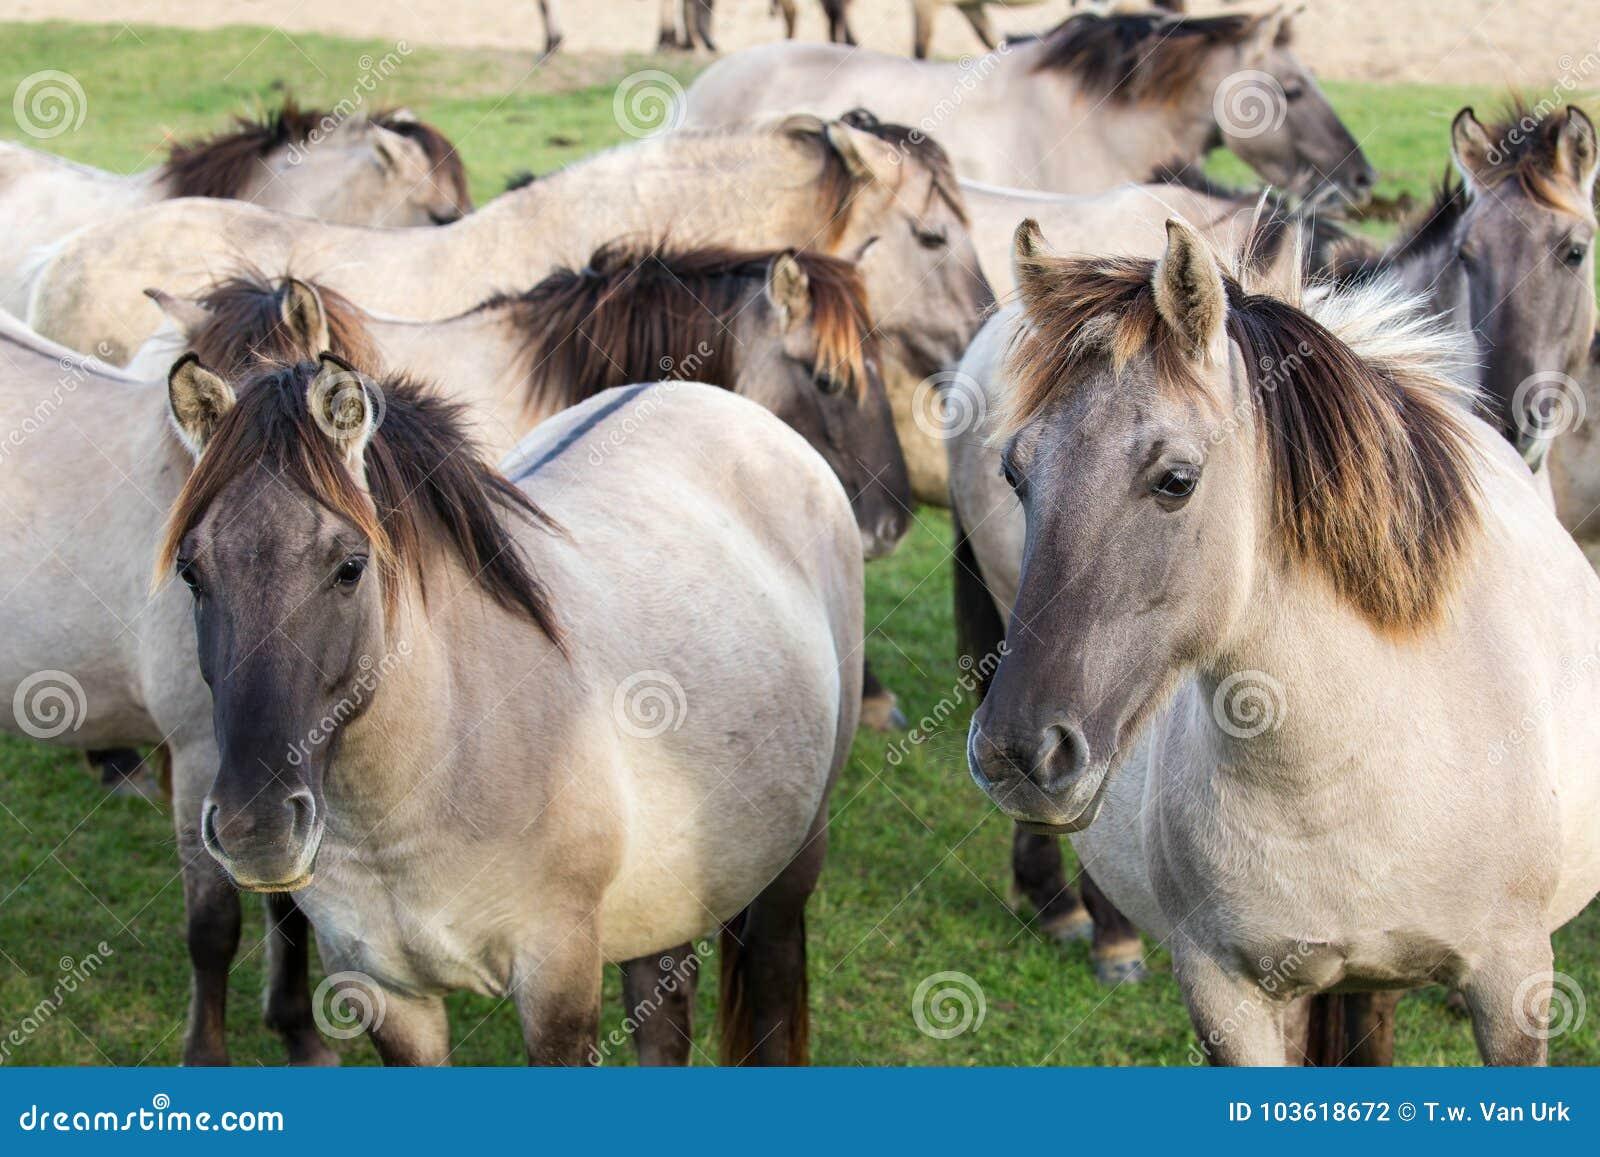 Dutch National Park Oostvaardersplassen with herd of konik horses